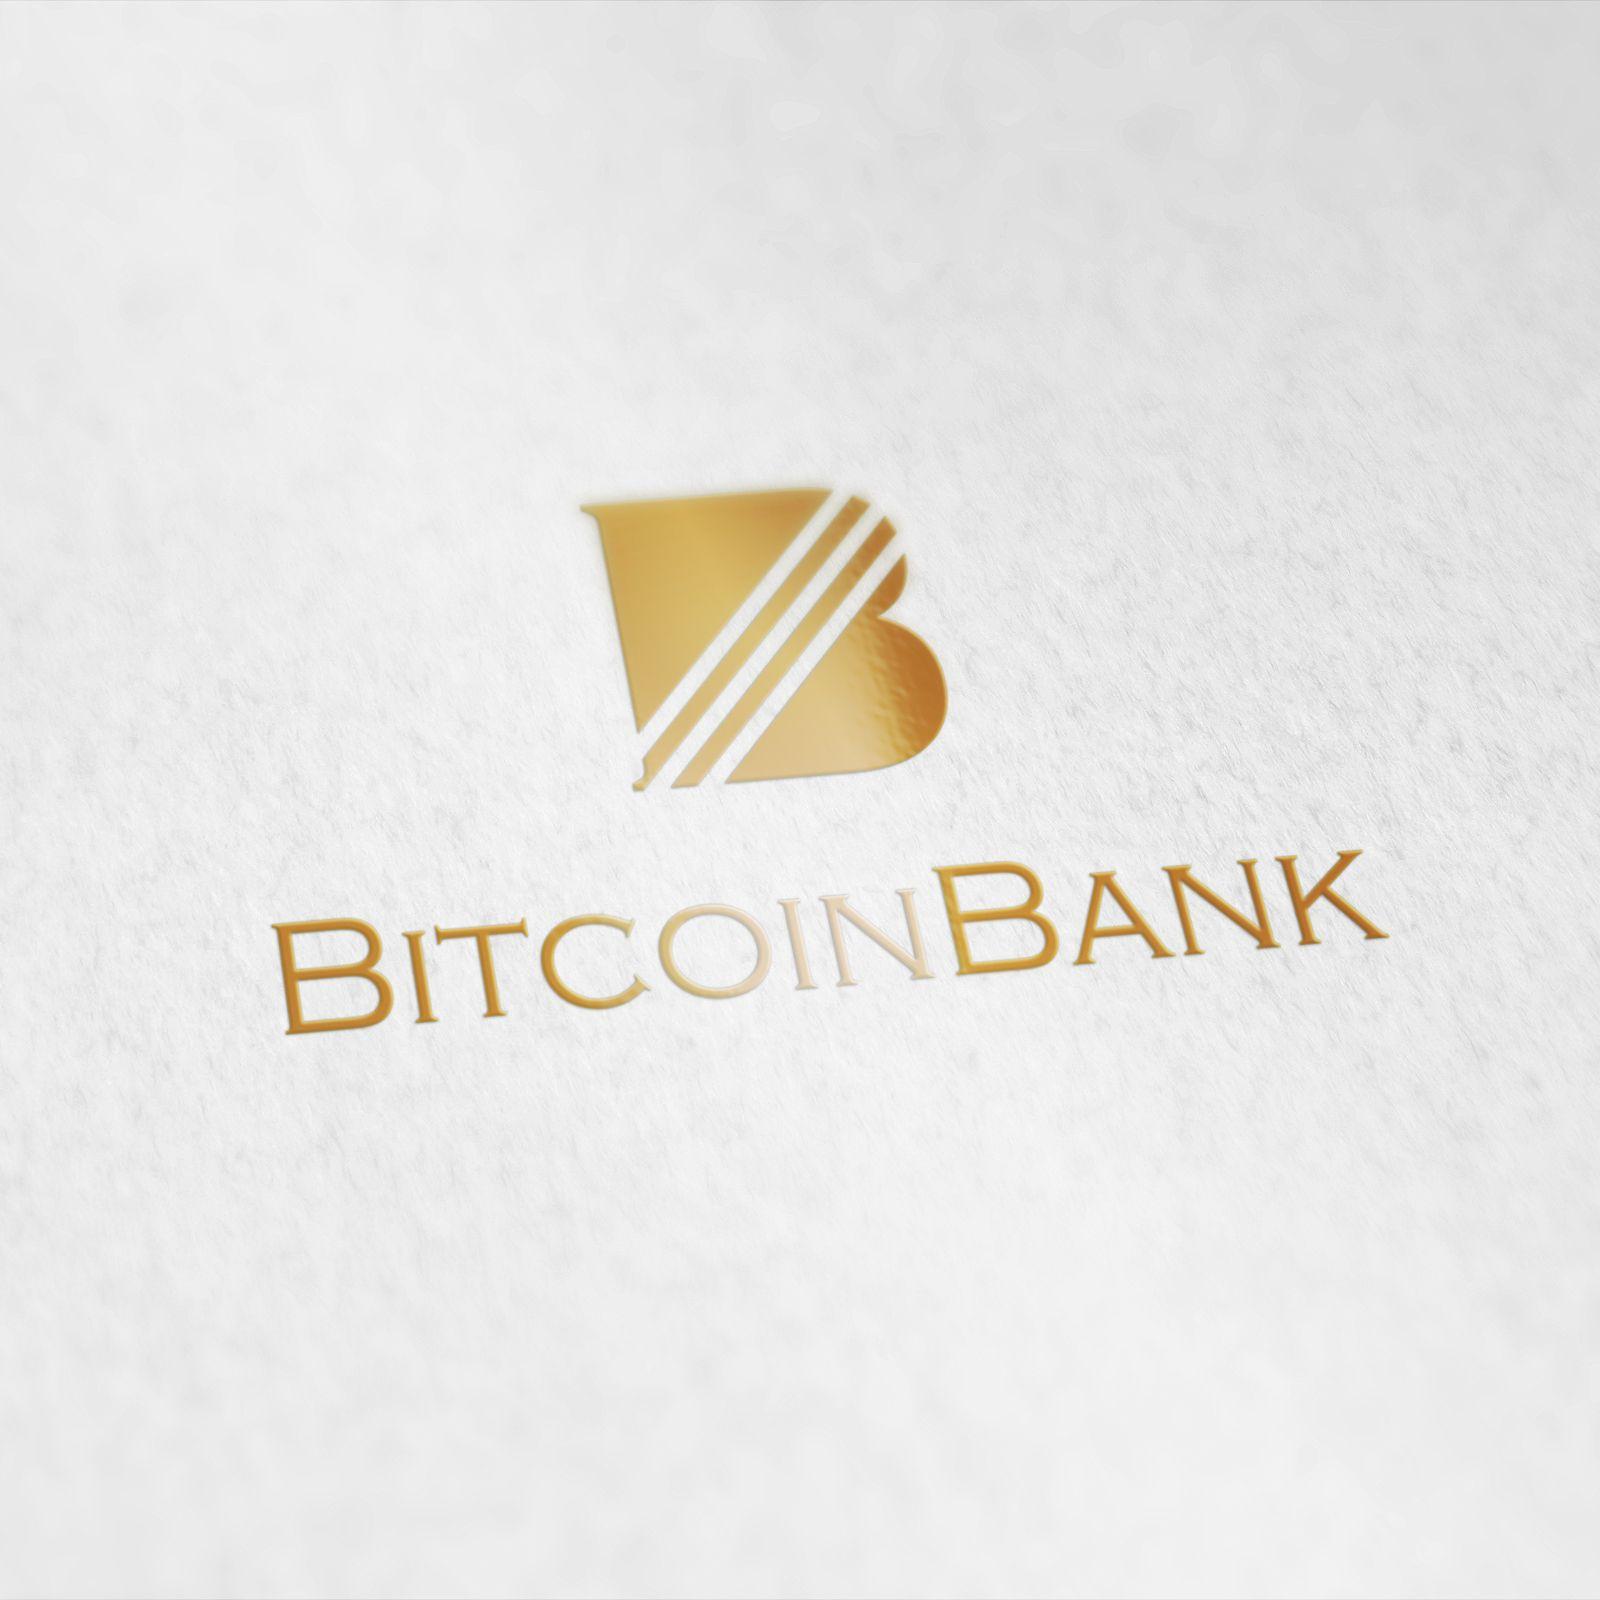 BitcoinBank - Логотип - дизайнер sviaznoyy